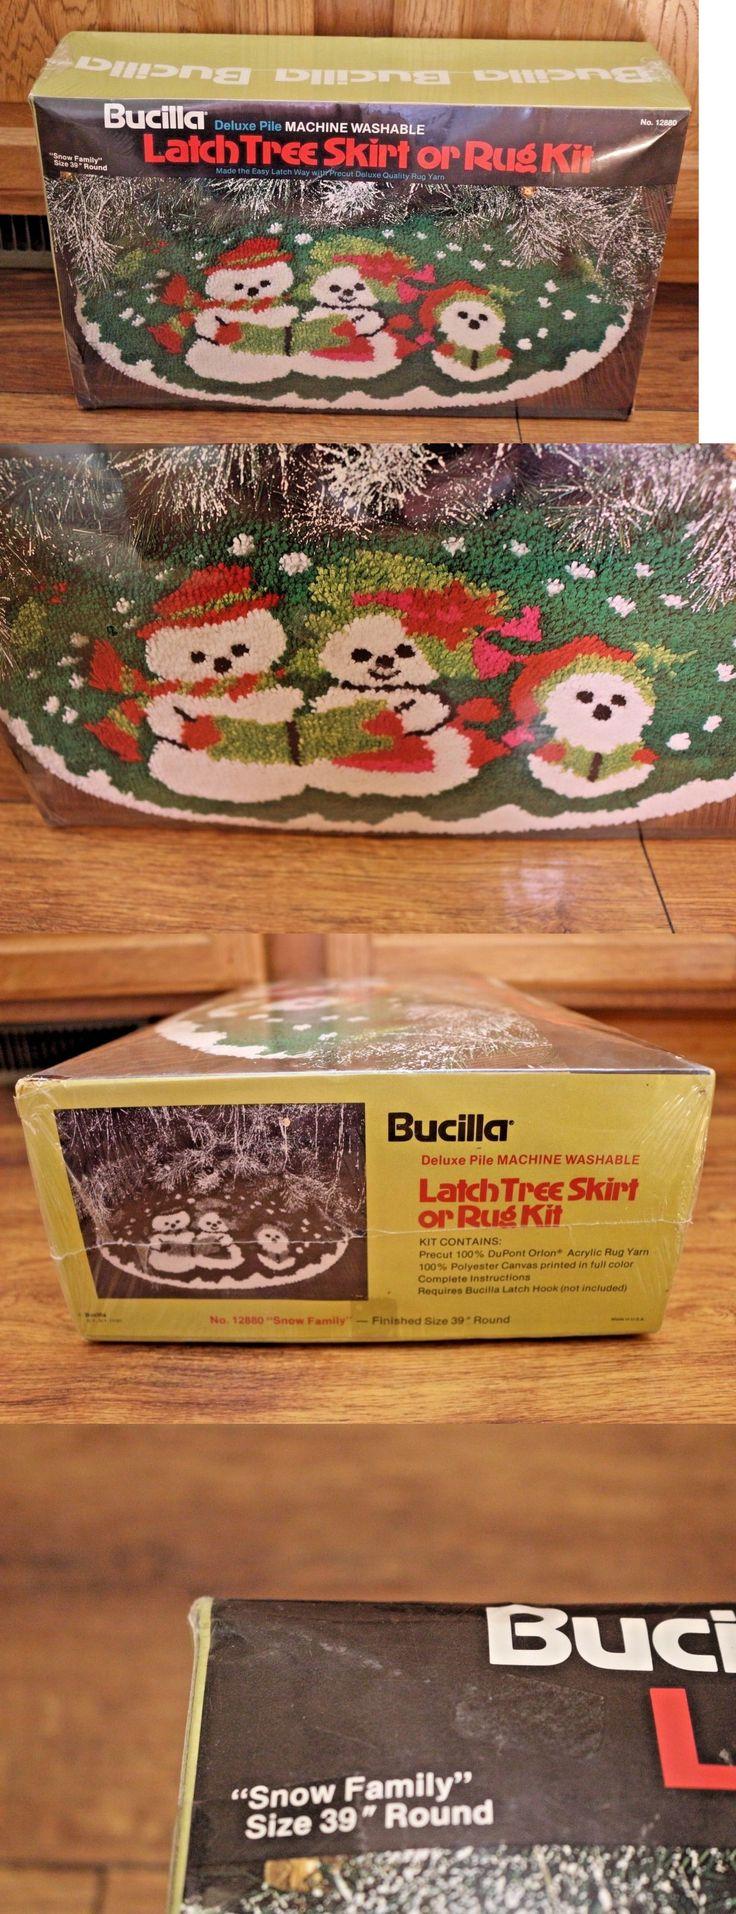 Latch Hooking Kits 28148 Bucilla Hook Tree Skirt Or Rug Kit 12880 Snow